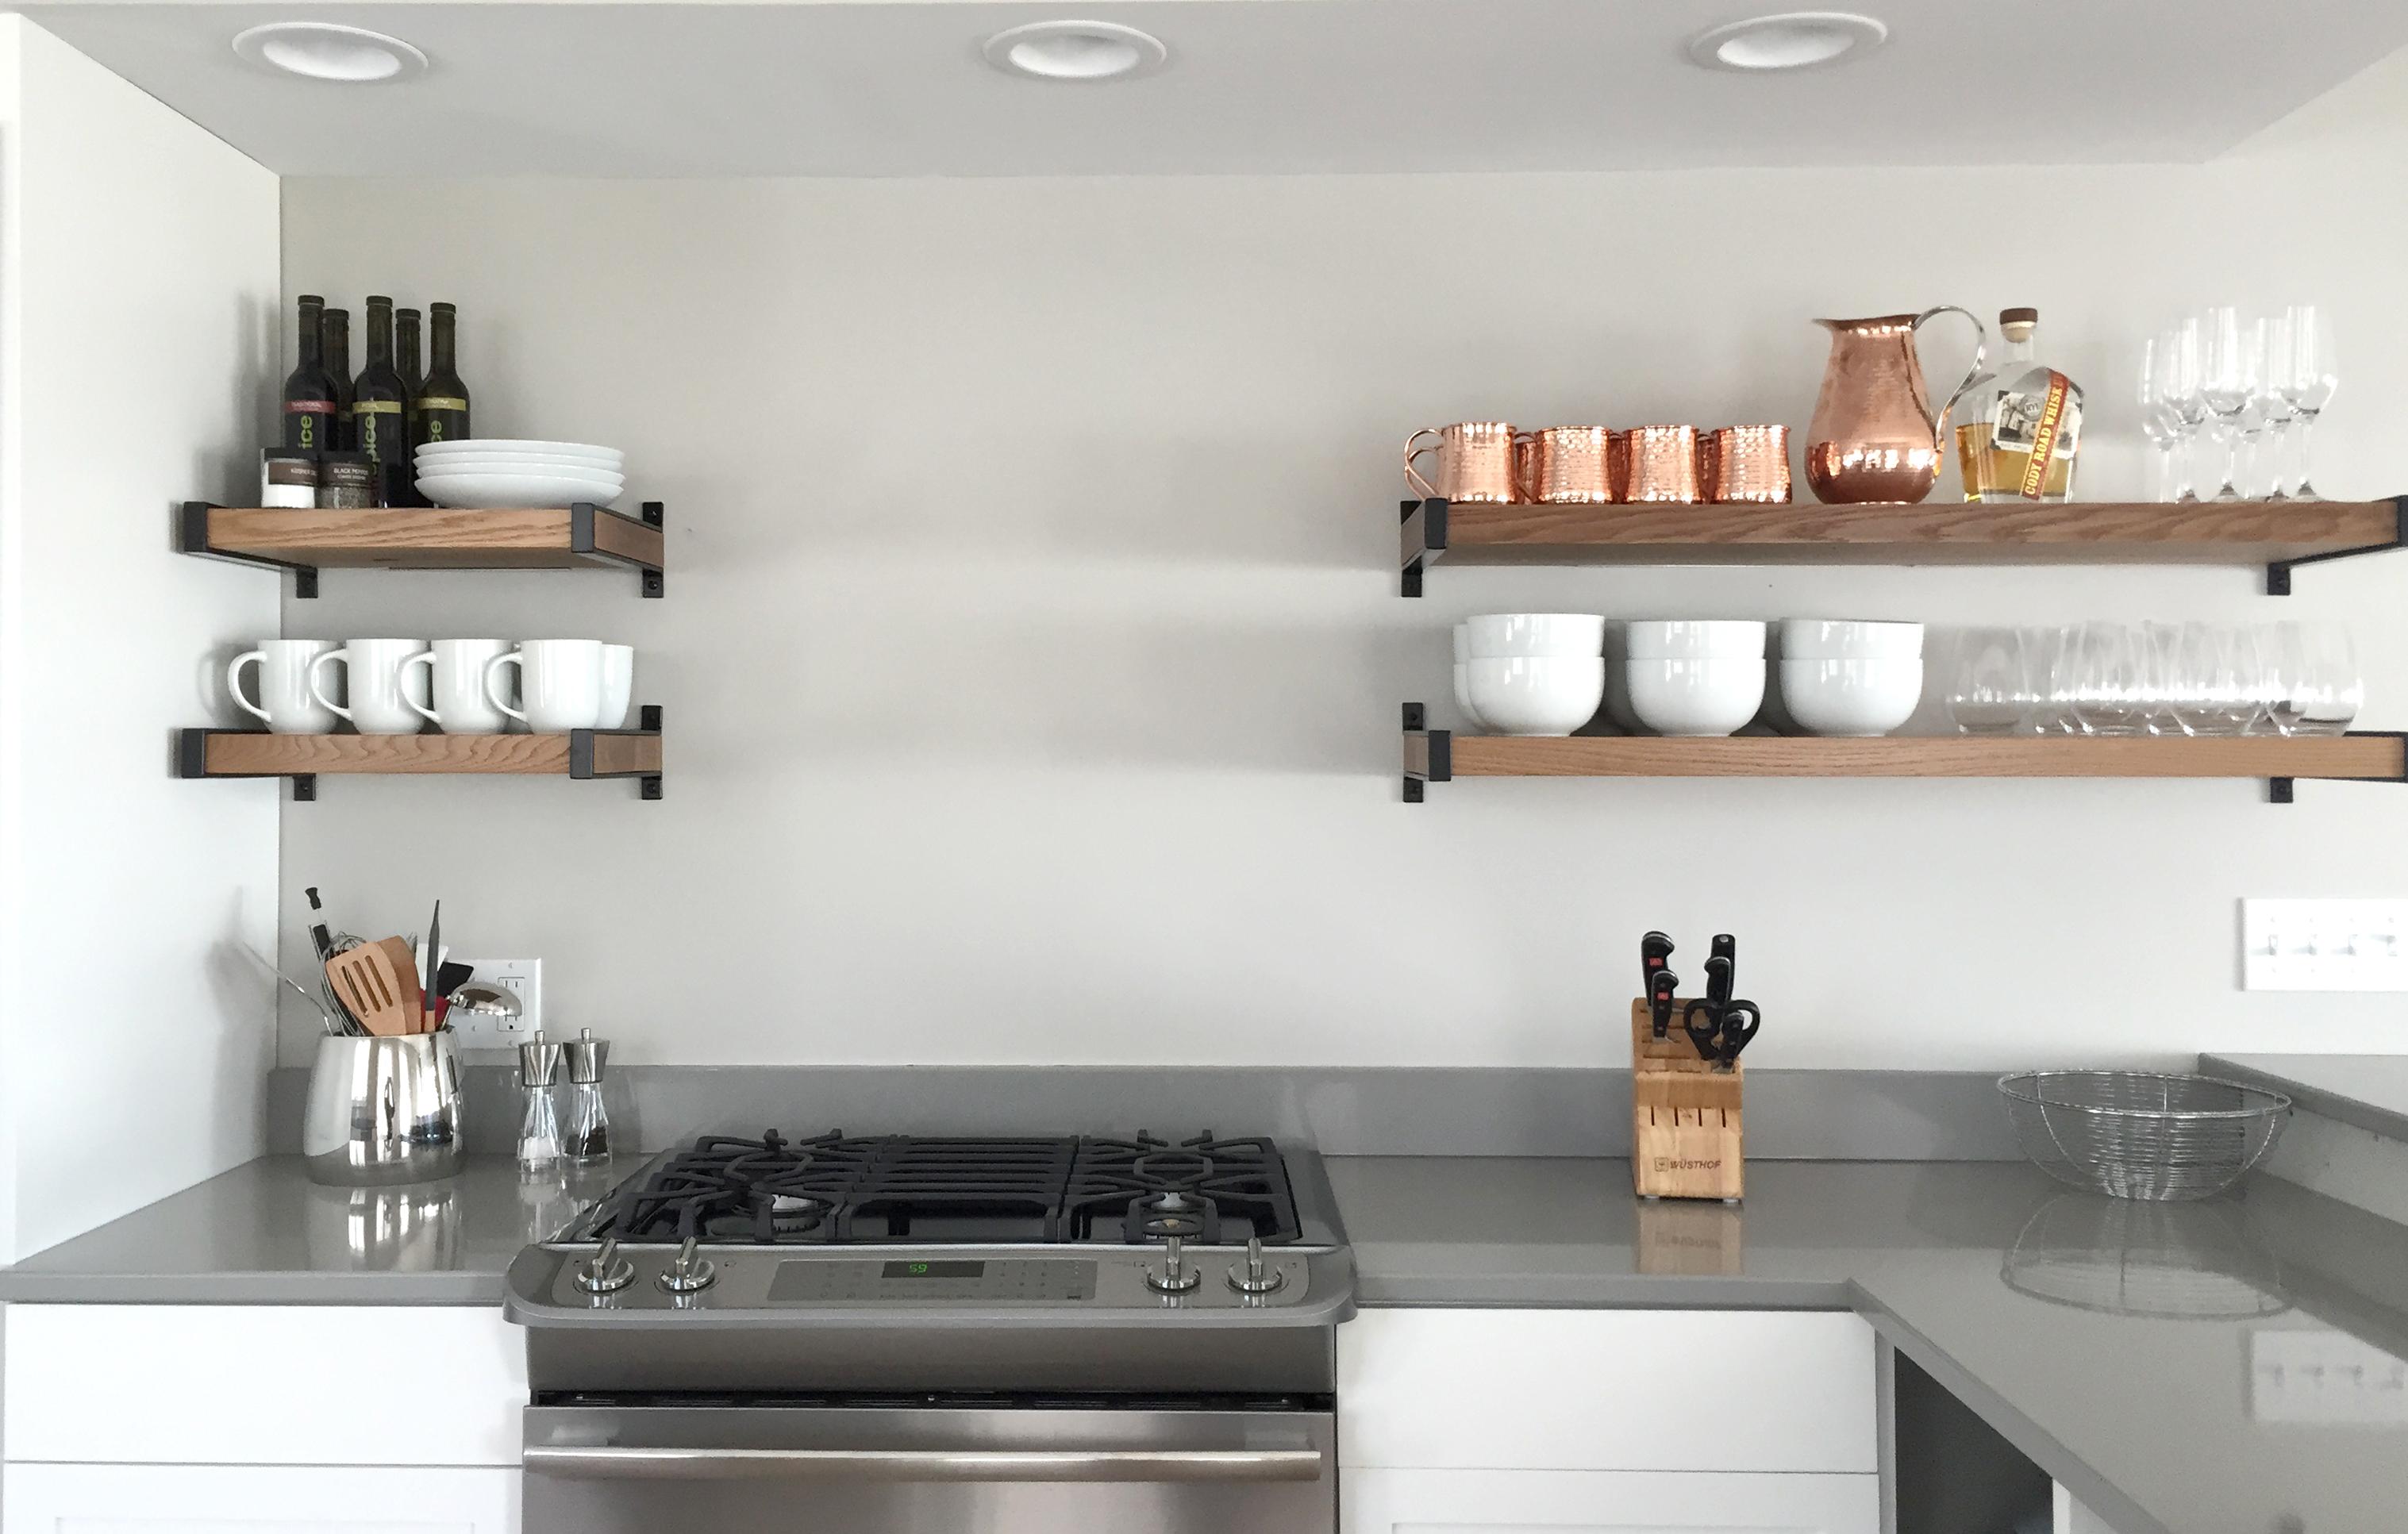 Modern kitchen shelves - Wood And Steel Open Shelving Modern Kitchen Storage